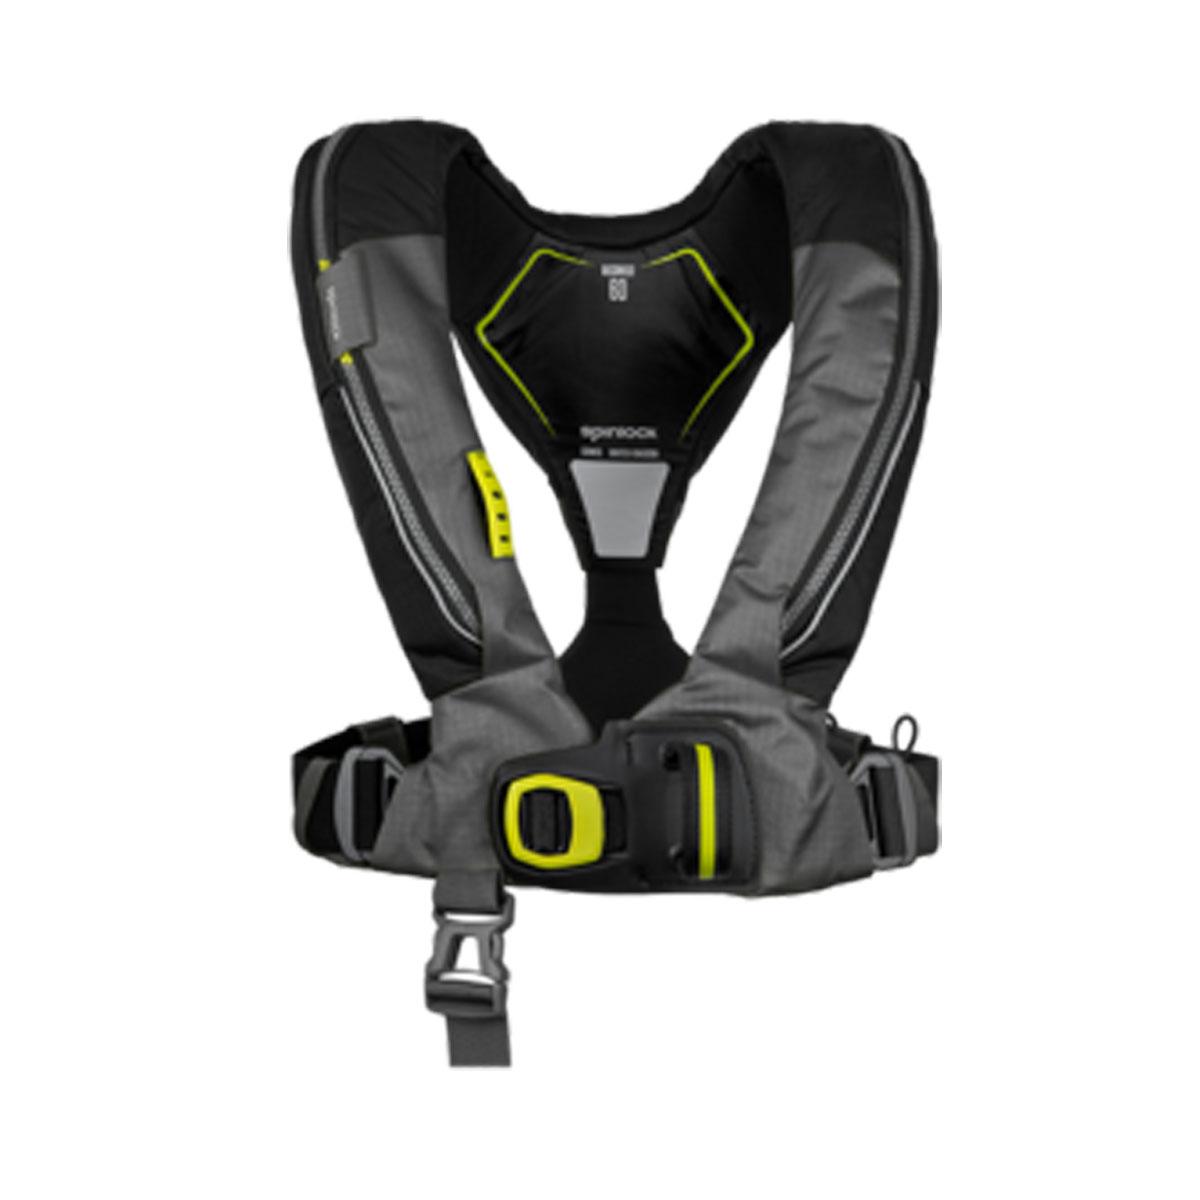 Spinlock Deckvest 6D Lifejacket Harness 170N (DW-LJH6D)